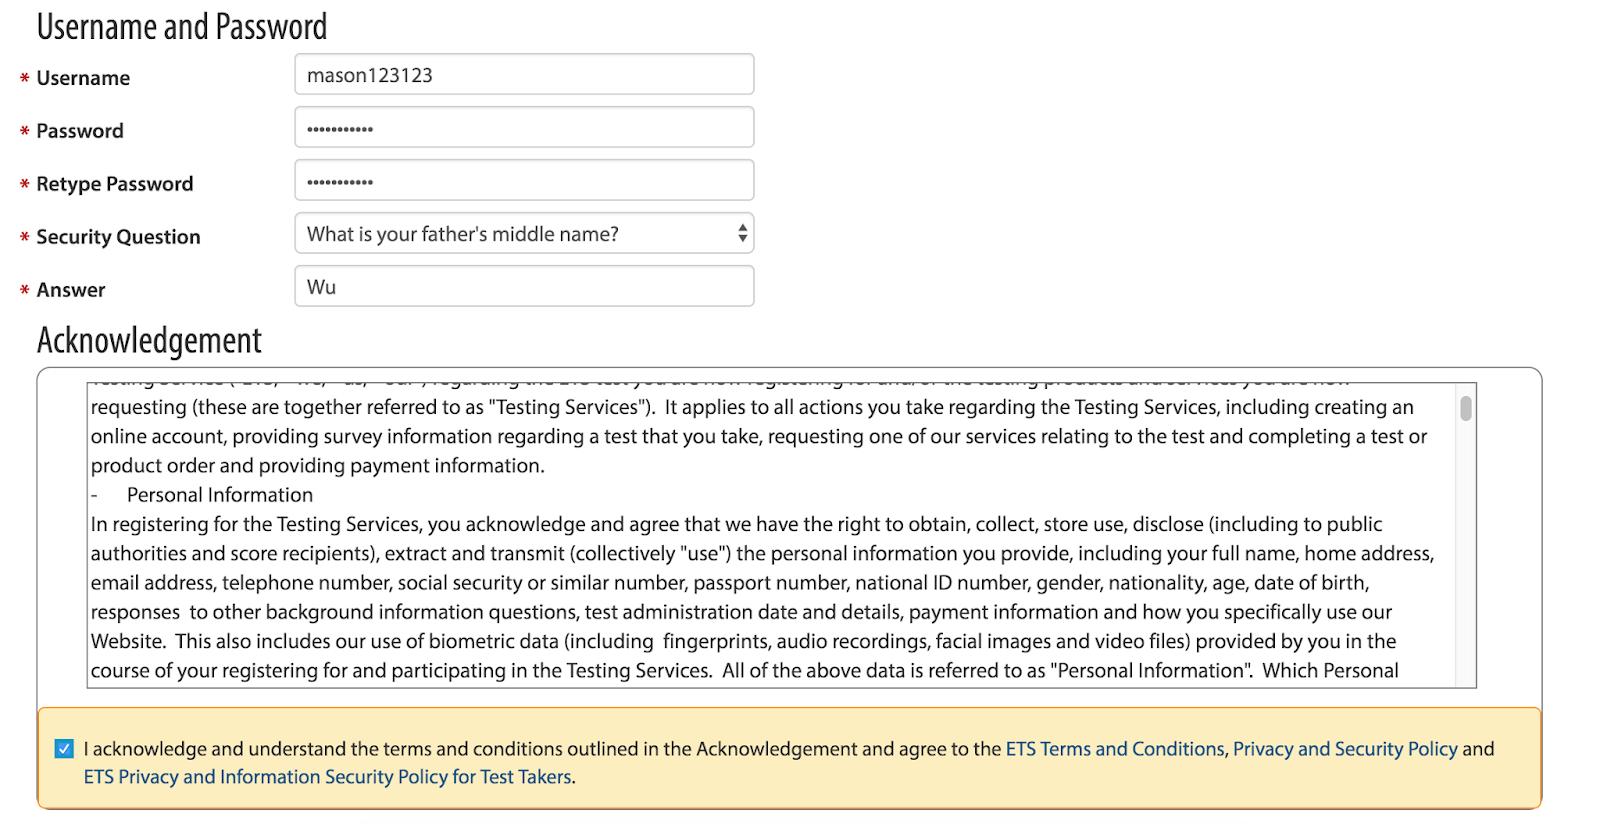 Mason GRE: GRE帳號註冊流程與問題解決 (最新版ETS註冊網頁) (TOEFL註冊也可參考)